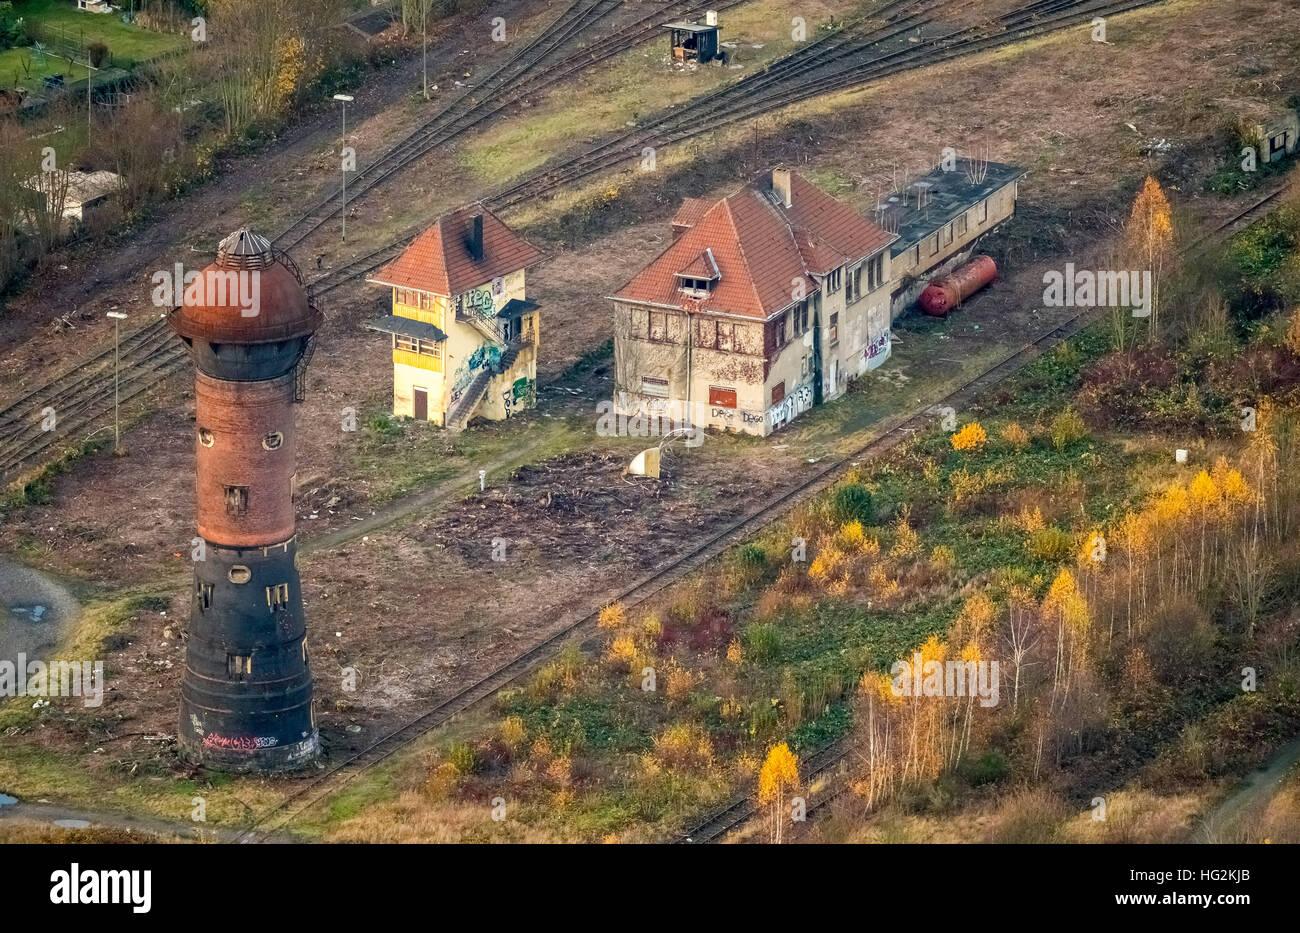 Aerial view, Duisburg Bissingheim Duisburg Wedau old water tower Bissingheim, Duisburg, Ruhr aeria, north rhine - Stock Image